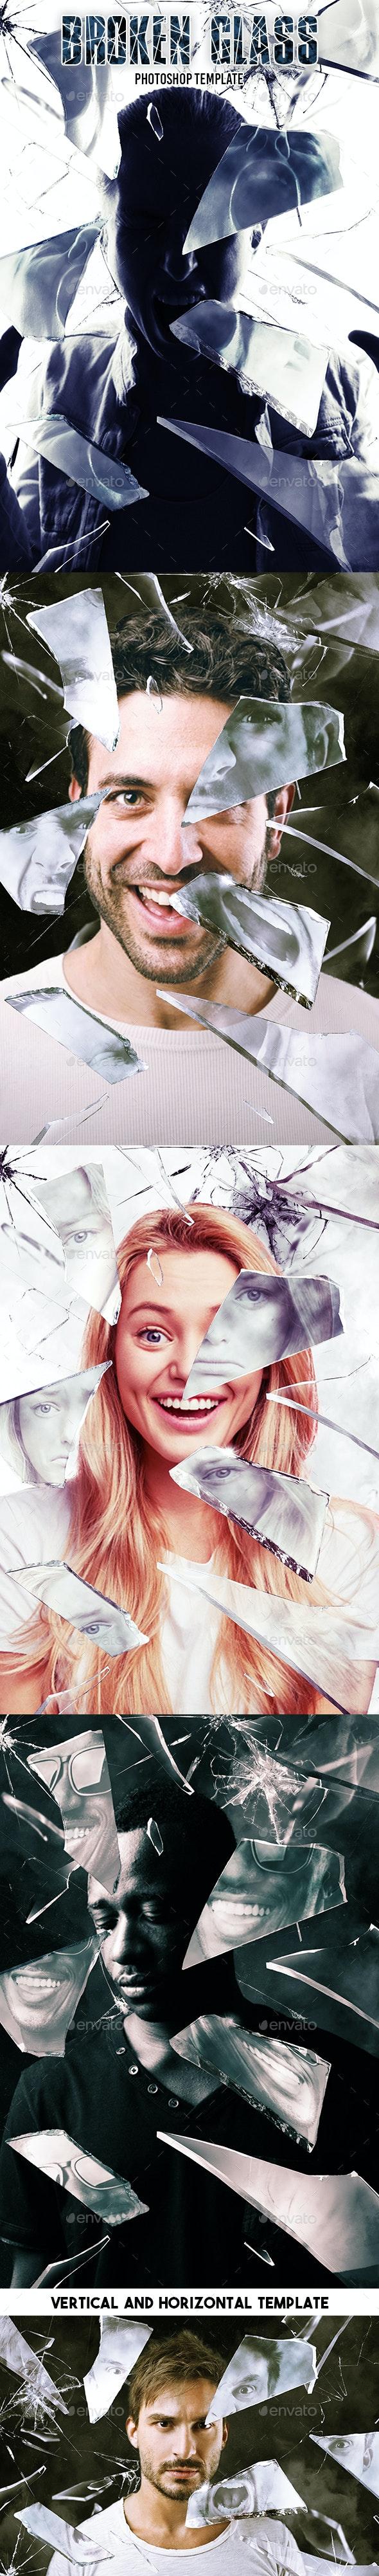 Broken Glass Photoshop Template - Artistic Photo Templates